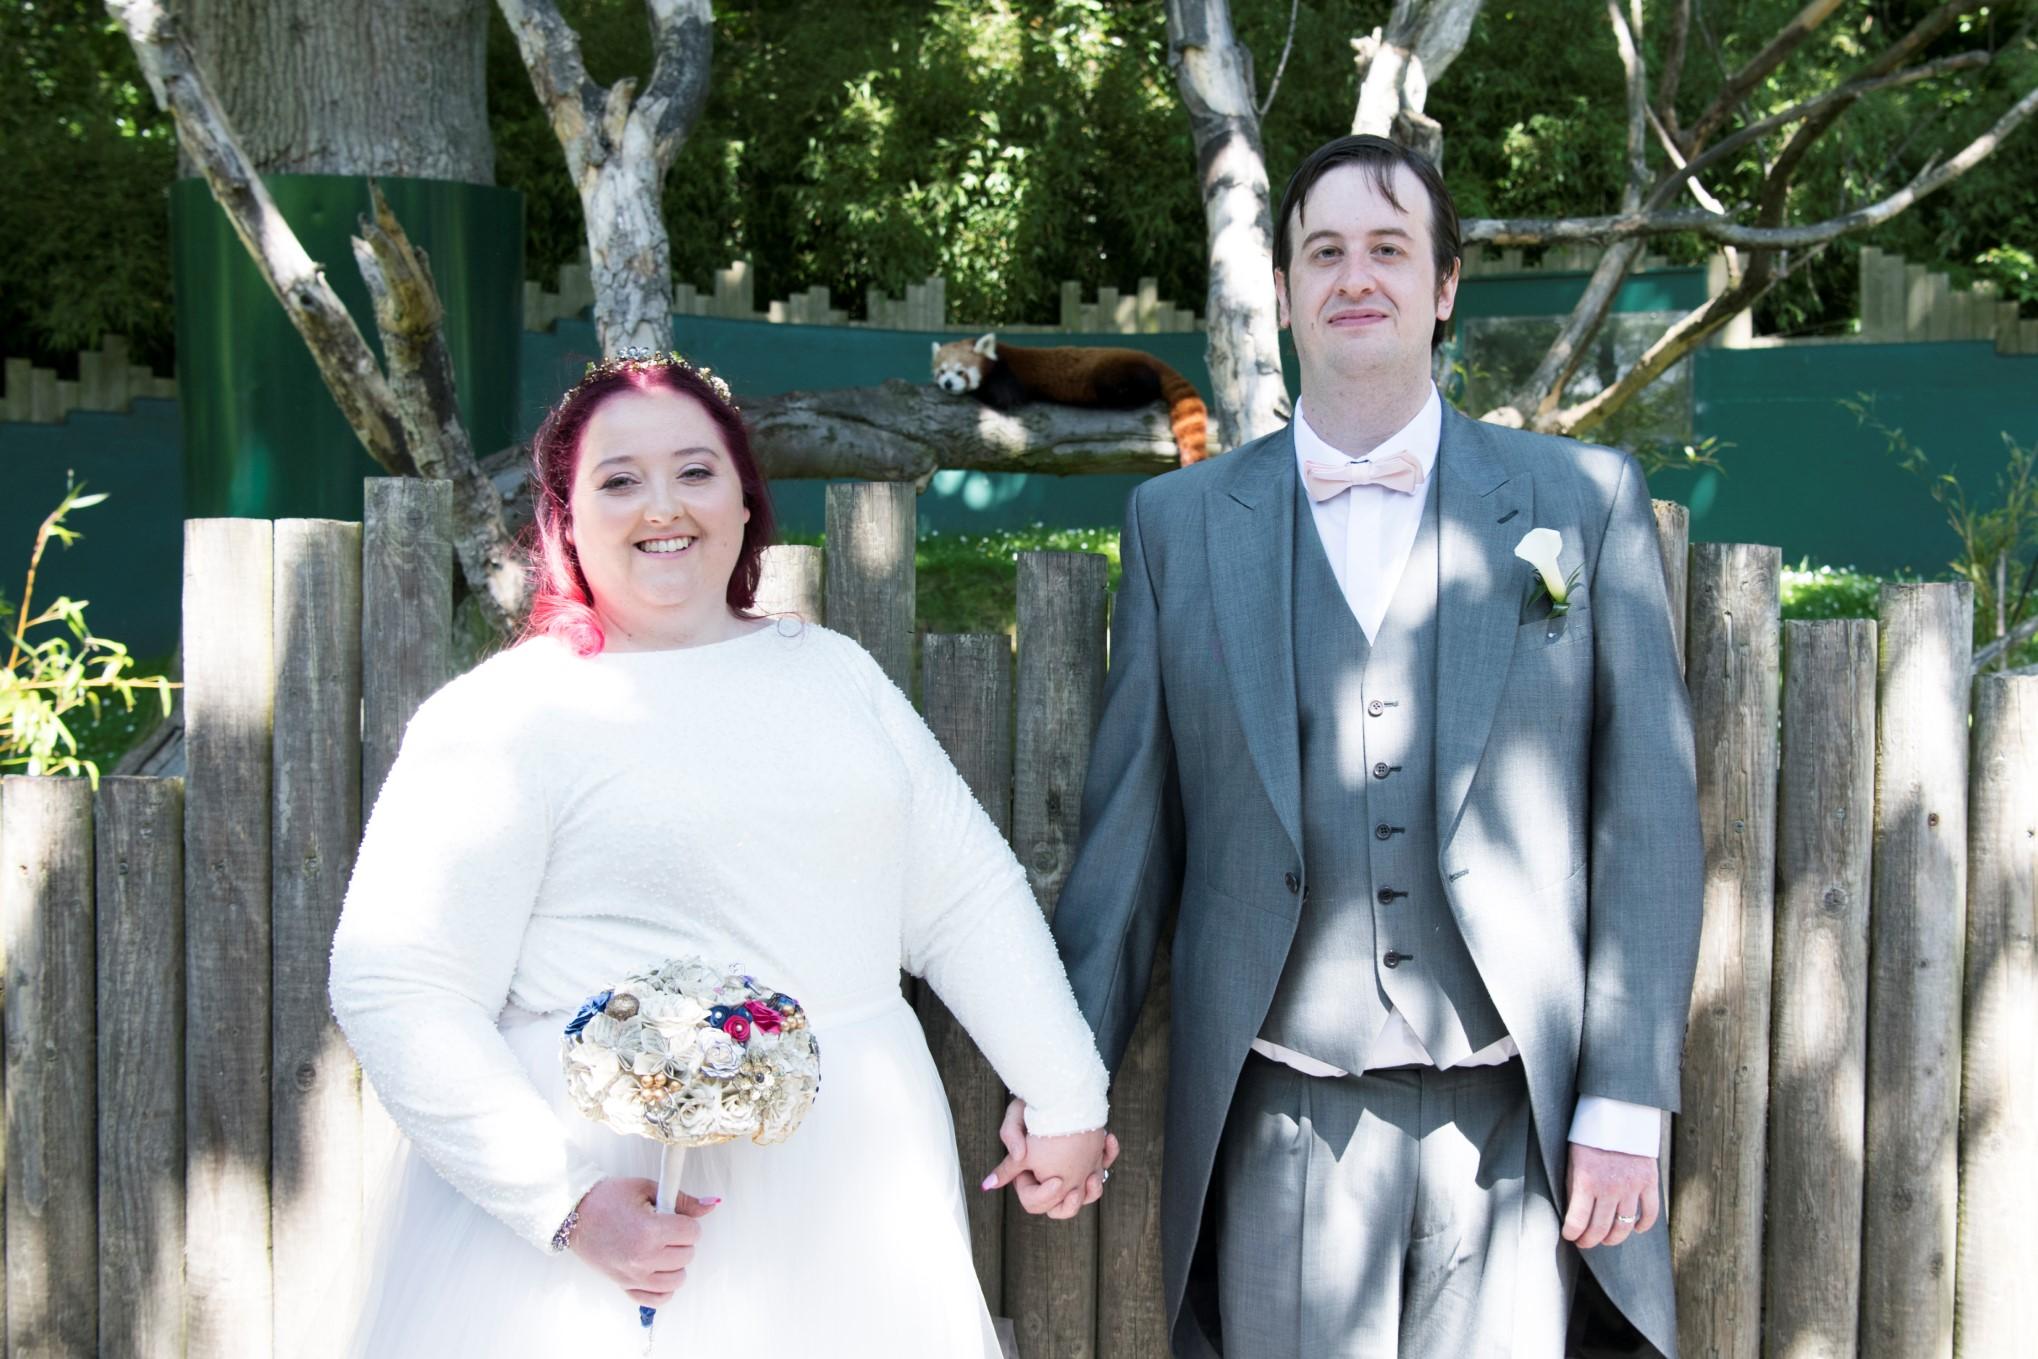 Zoo Wedding- Emma May Photography- Unconventional Wedding- Unique Wedding Inspiration 12